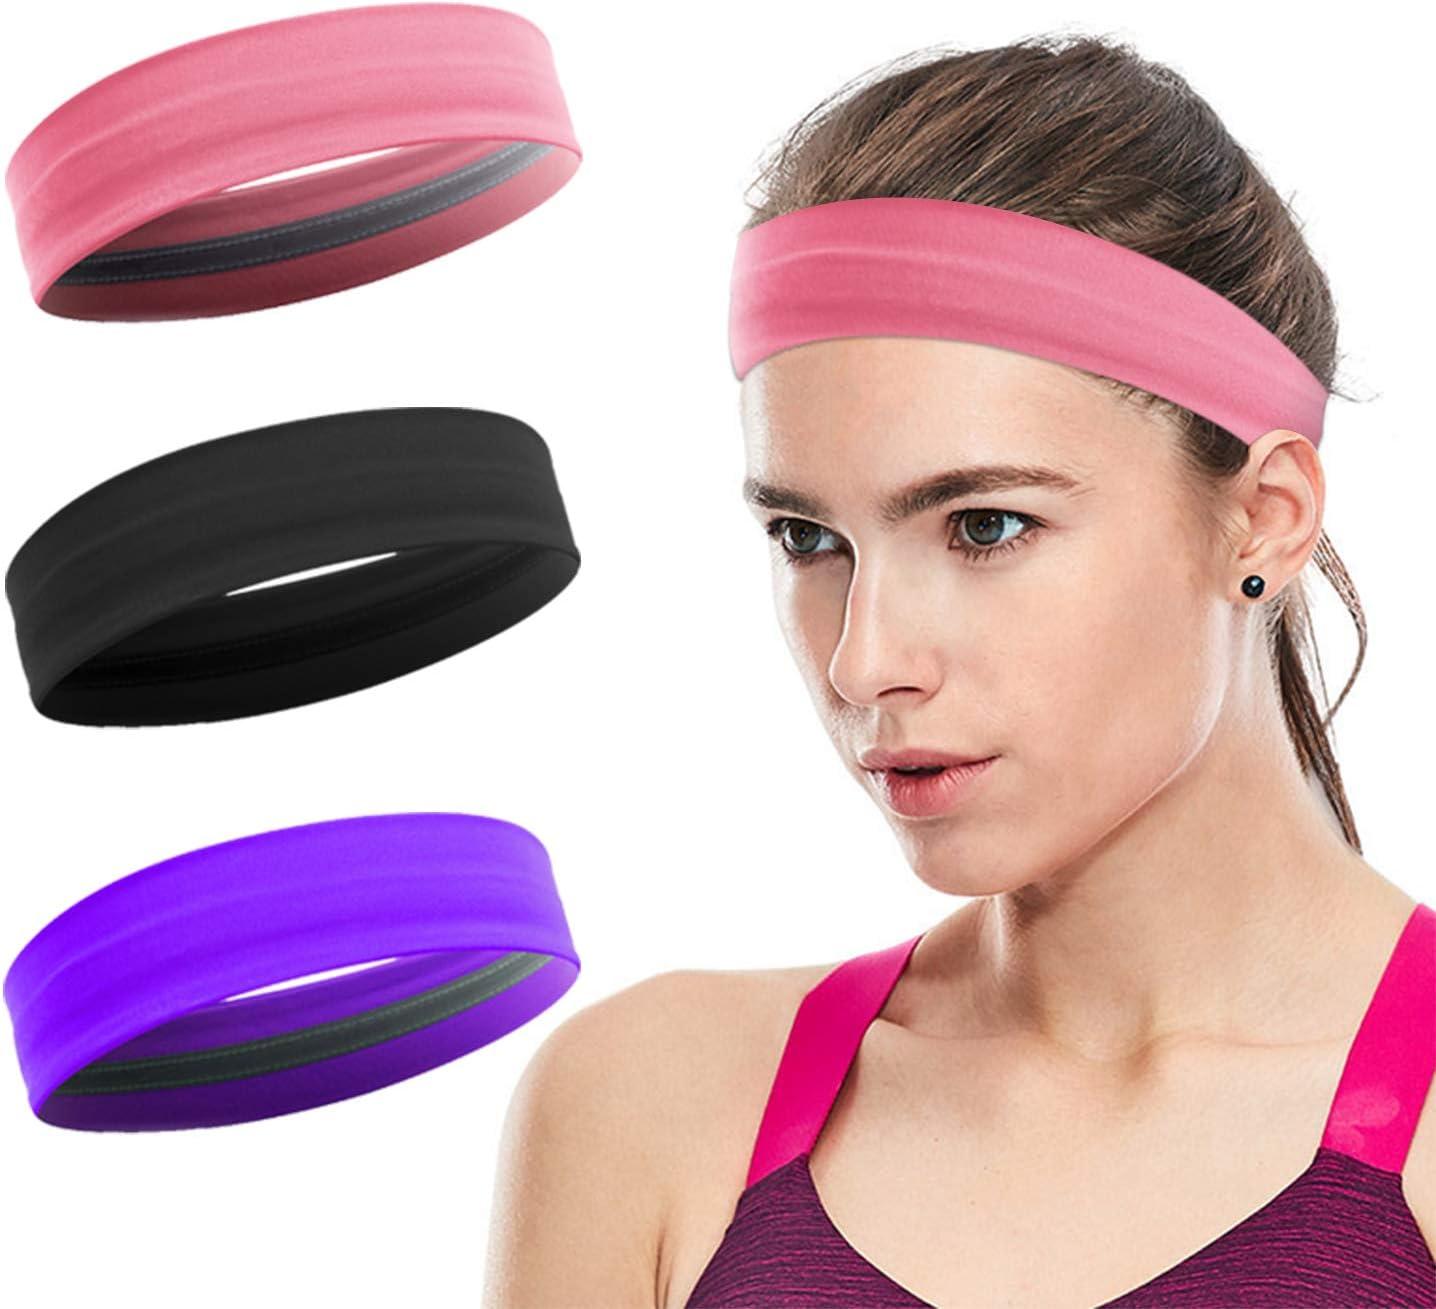 Fitness Athletic Yoga 3 Pack Stay Put Sweatbands for Women Bike Non-Slip Elastic Sweat Band Head Bands for Sports Head Bands Women Hair XIXOV Workout Headbands for Women